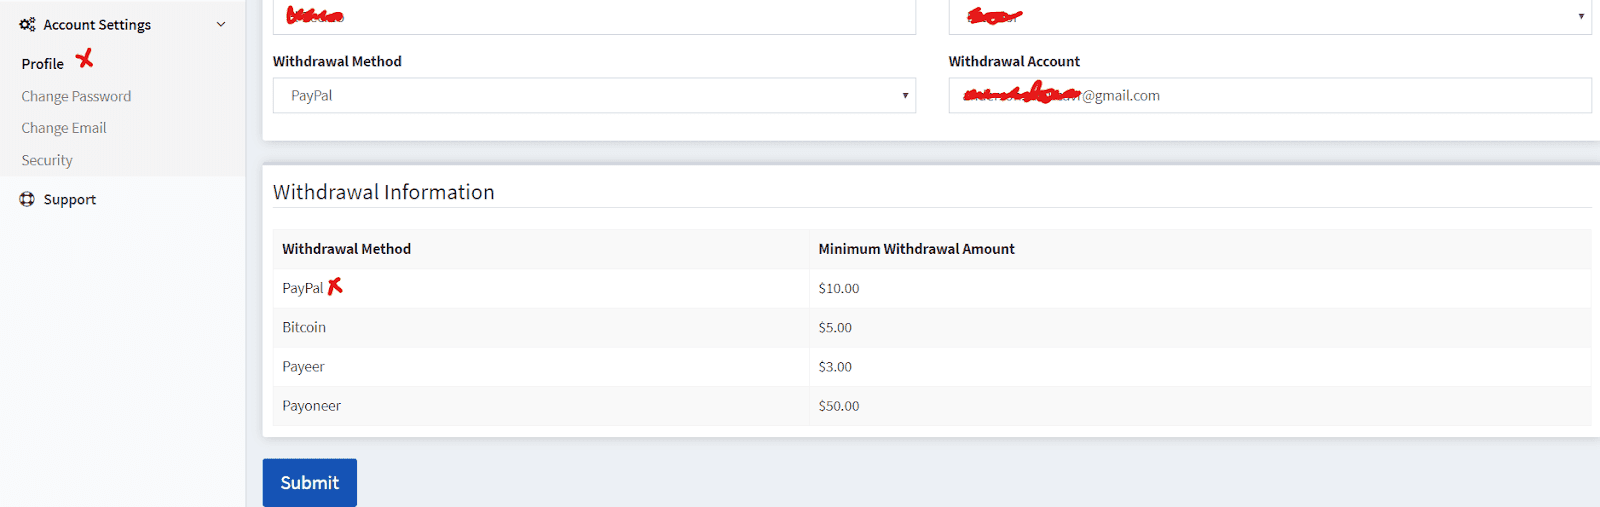 como configurar tu perfil de pago